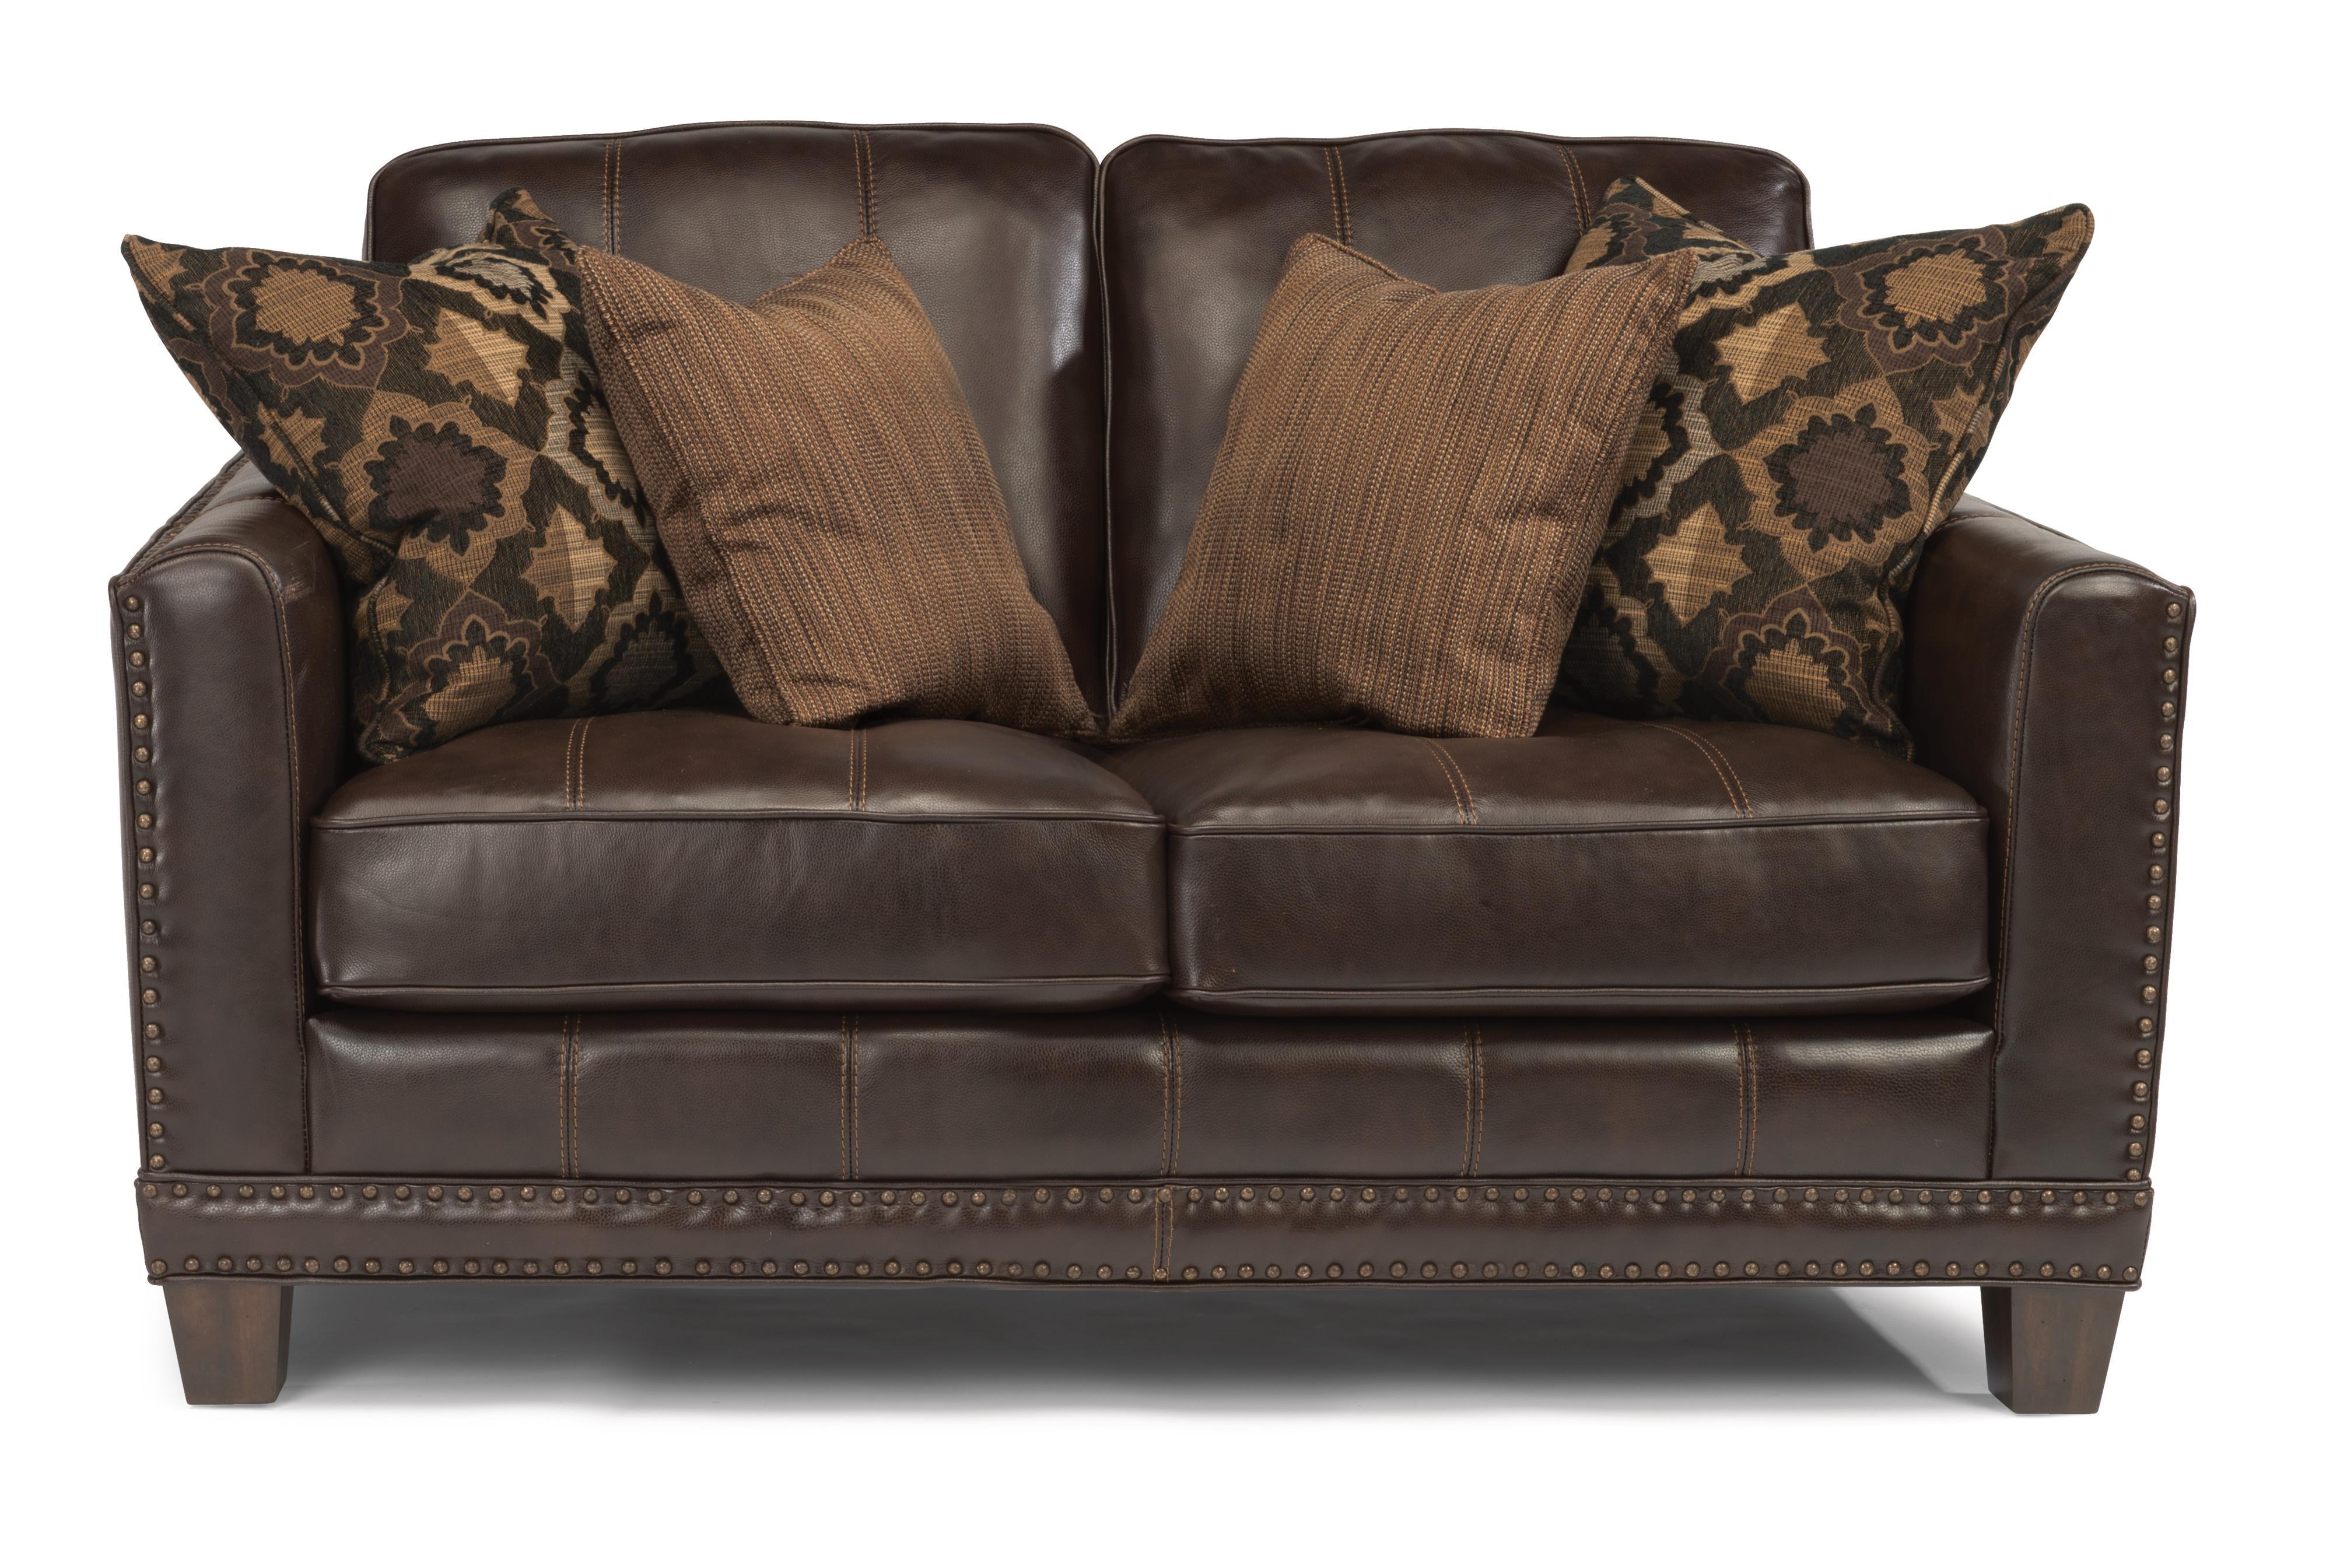 Latitudes - Port Royal Loveseat by Flexsteel at Walker's Furniture